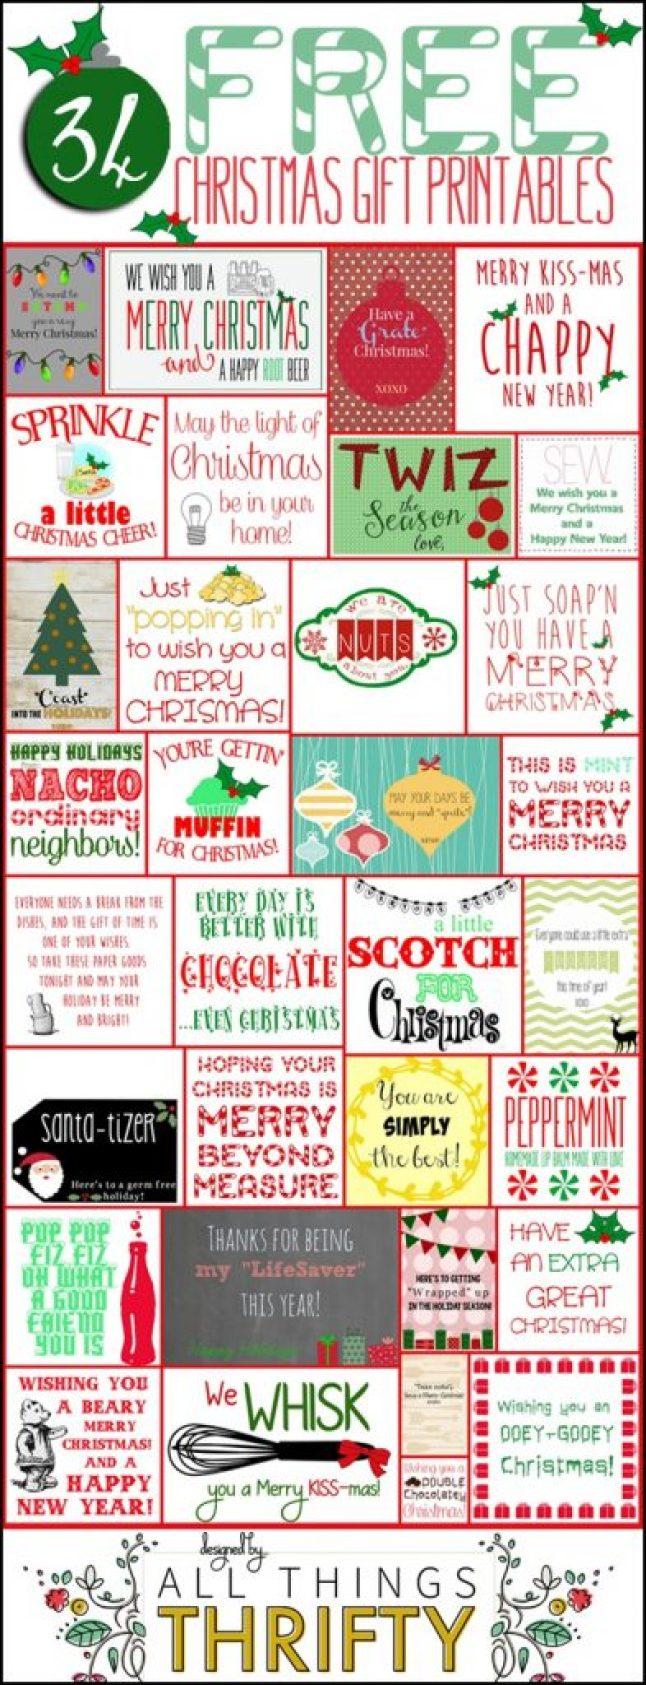 HAPPY Holidays: 34 Free Christmas Gift Tag Printables - Tatertots ...